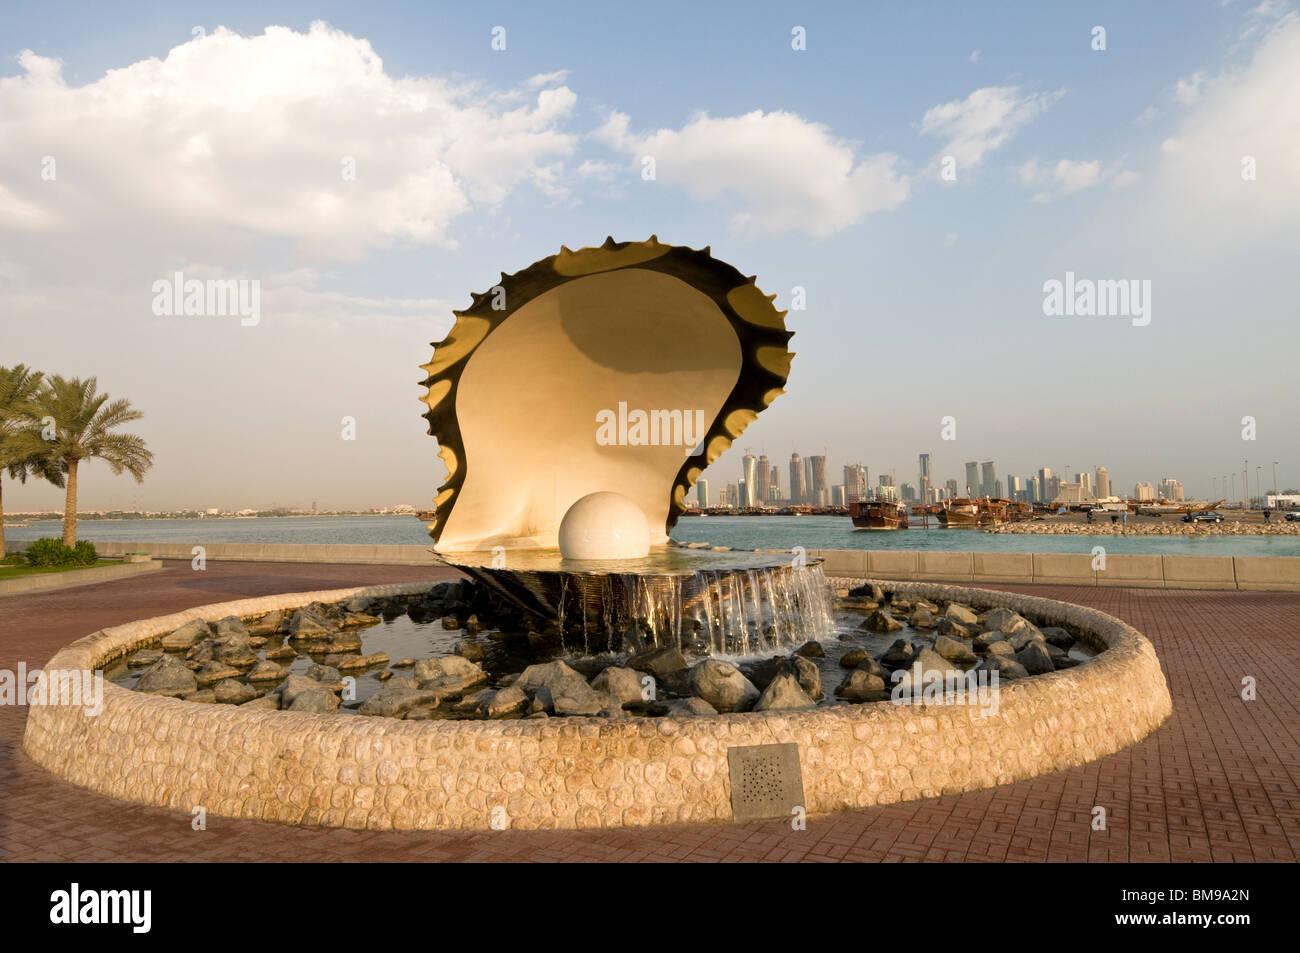 Elk205-1004 Qatar, Doha, Al Corniche, Pearl Monument with city skyline behind - Stock Image